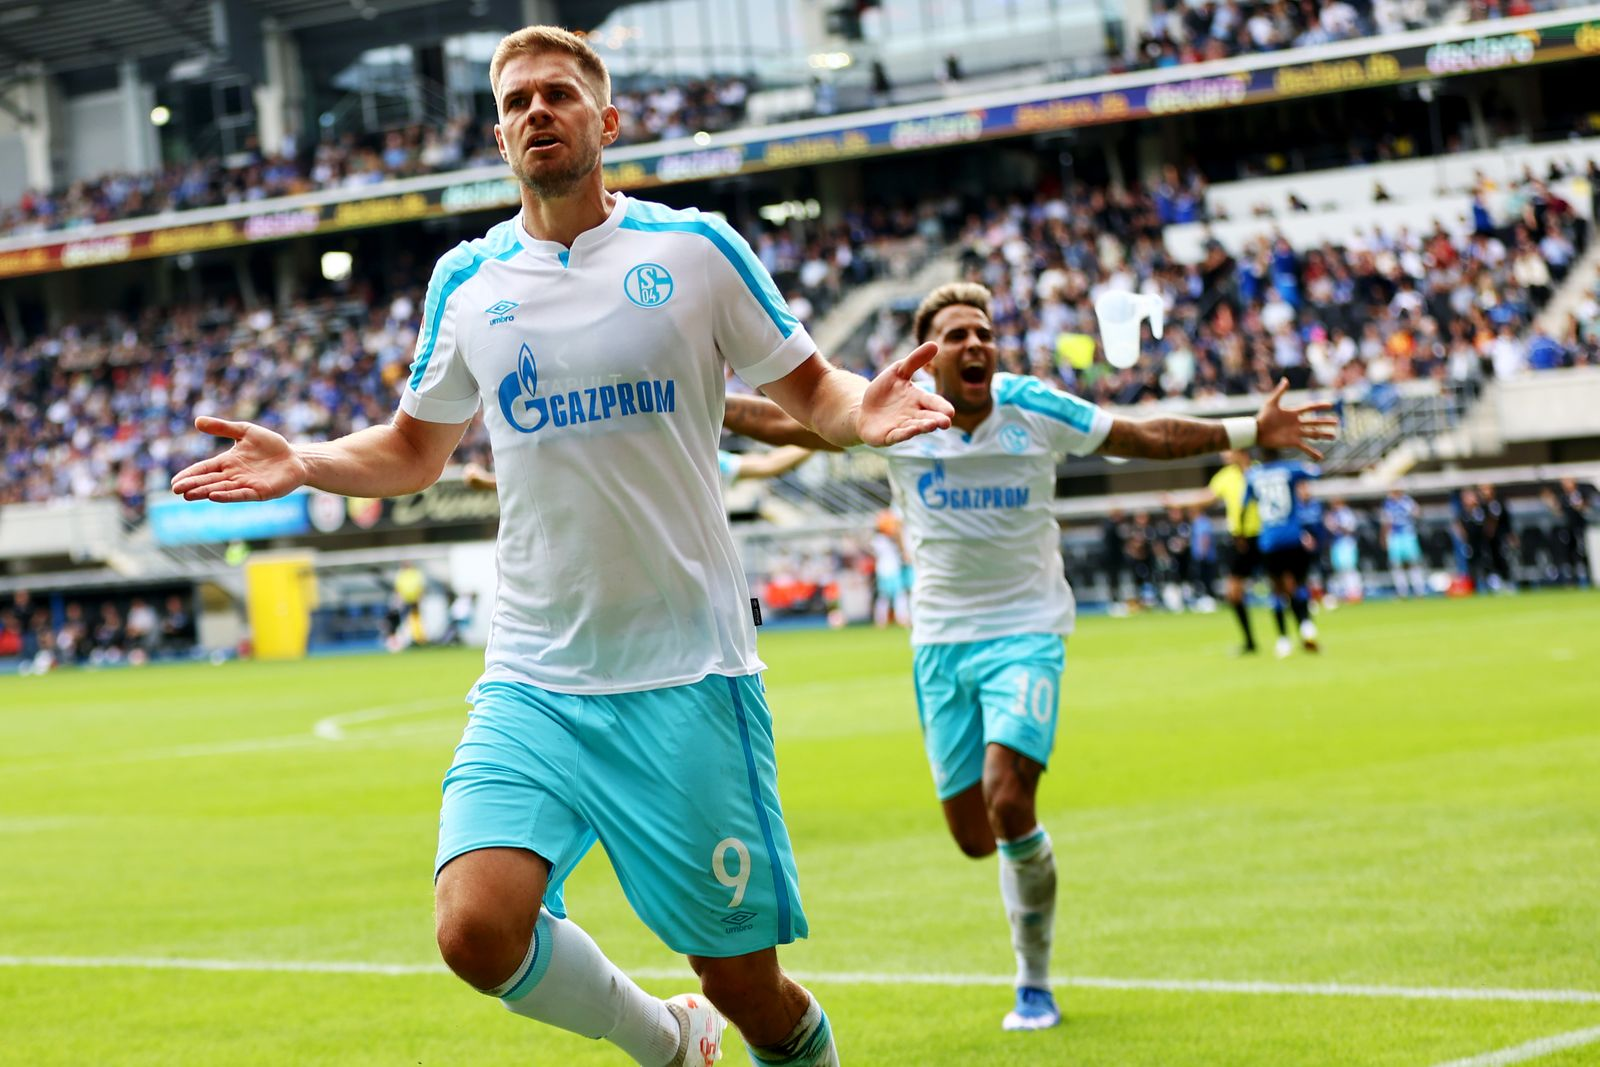 SC Paderborn 07 v FC Schalke 04 - Second Bundesliga